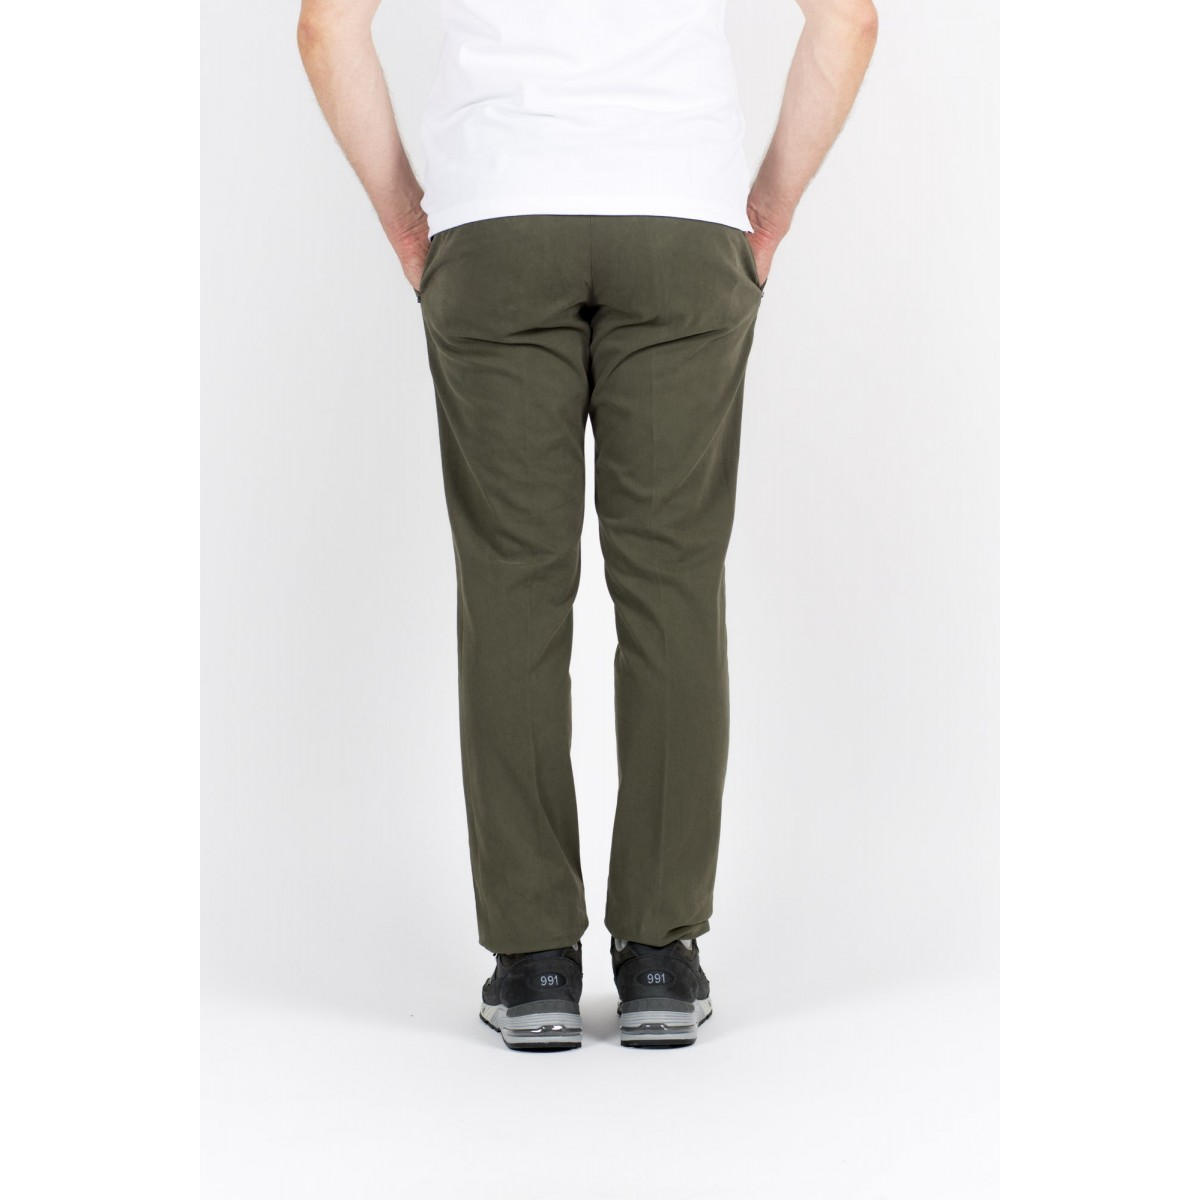 Pantalone uomo Entre amis - Pantalone tasca america slim con fondo 16cm 902 - Verde